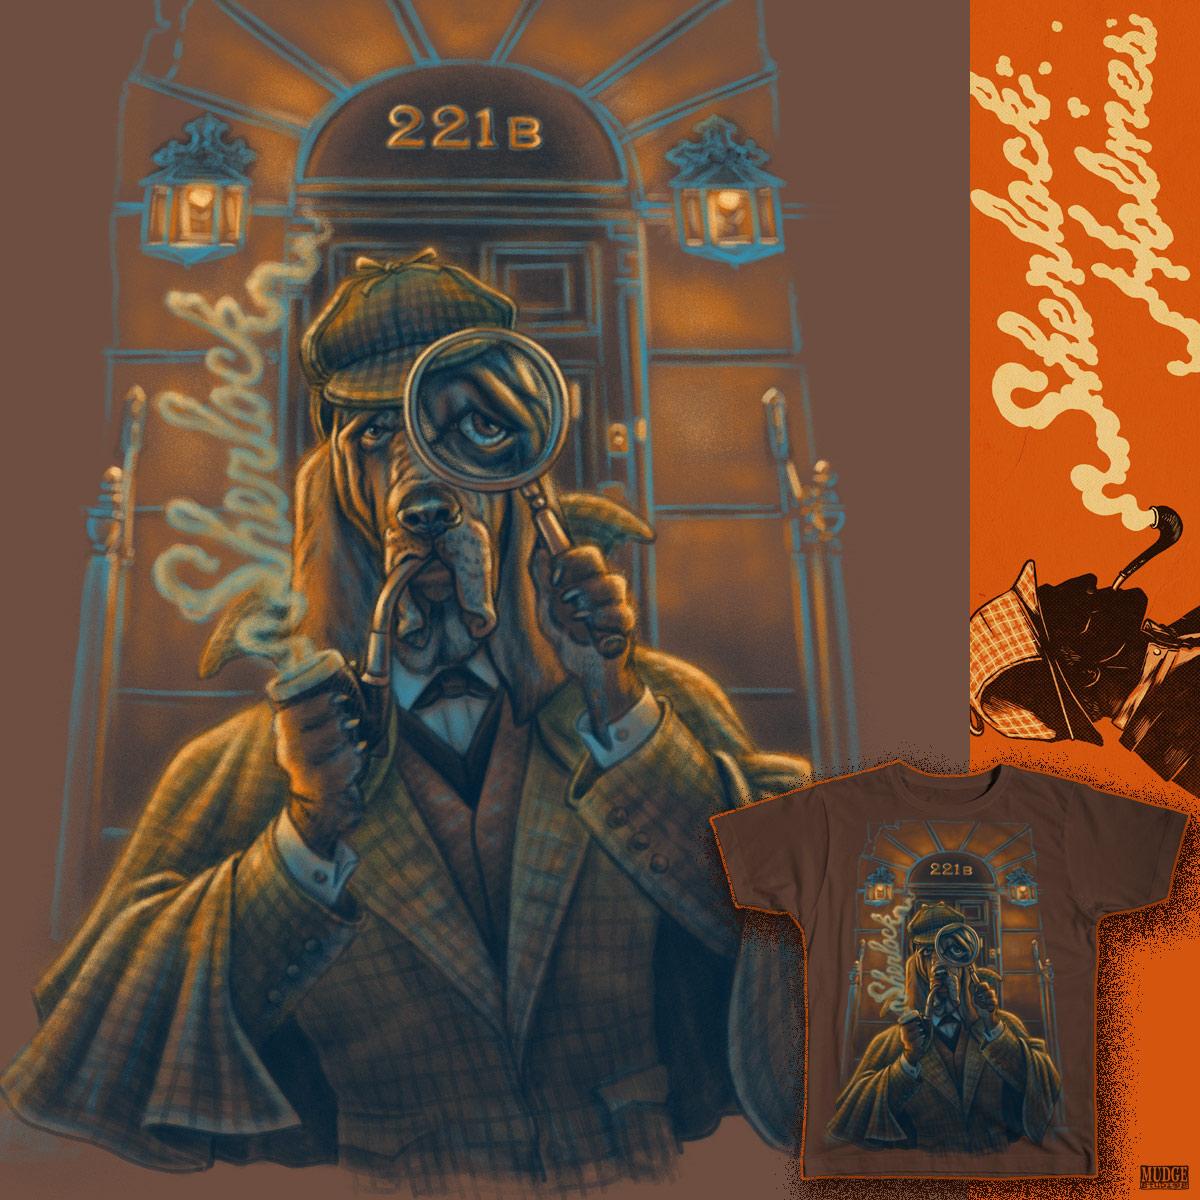 Sherlock Holmes Hound by MudgeStudios on Threadless